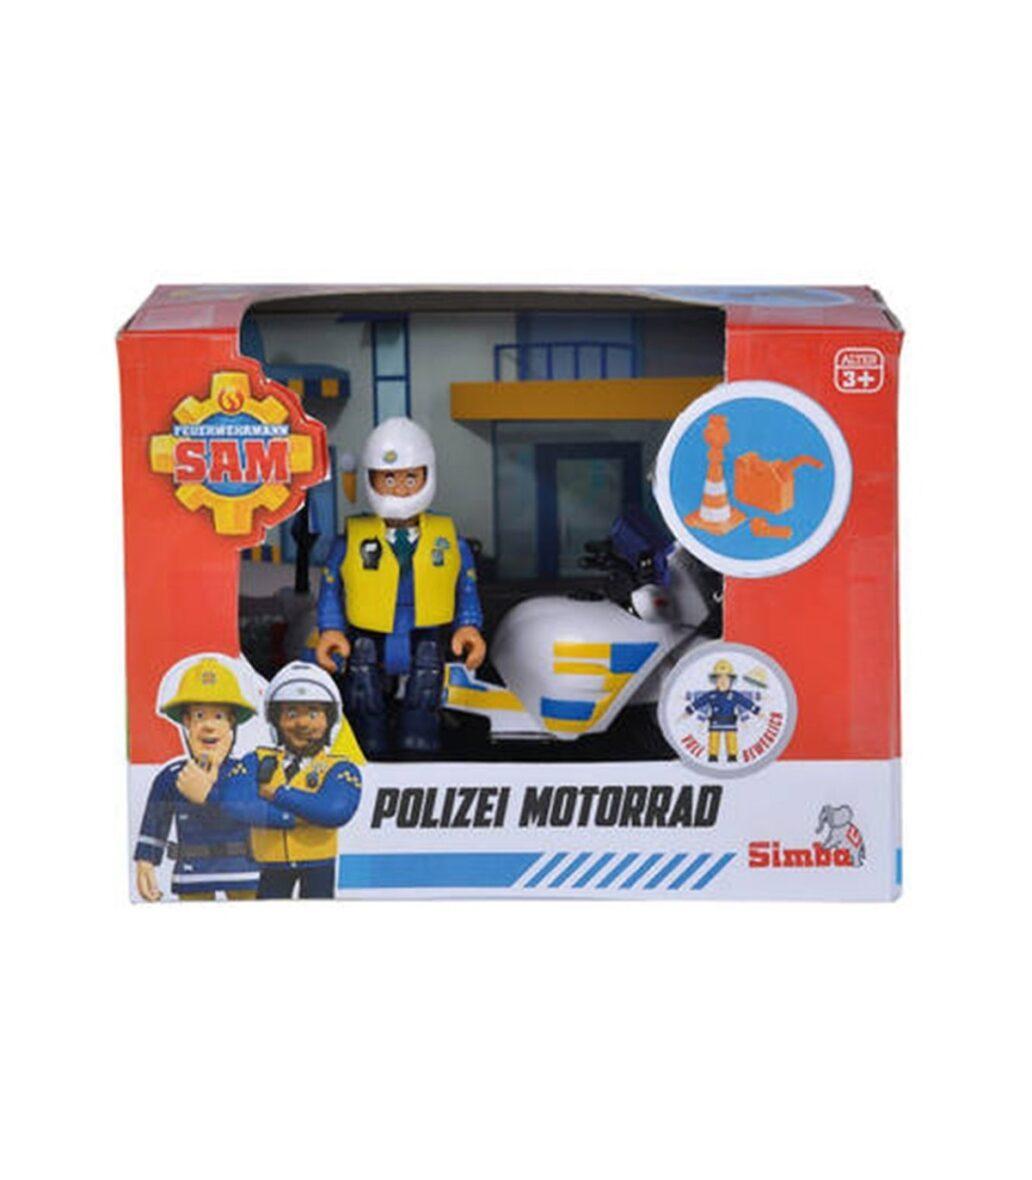 Sam Police Motocicleta Figurina